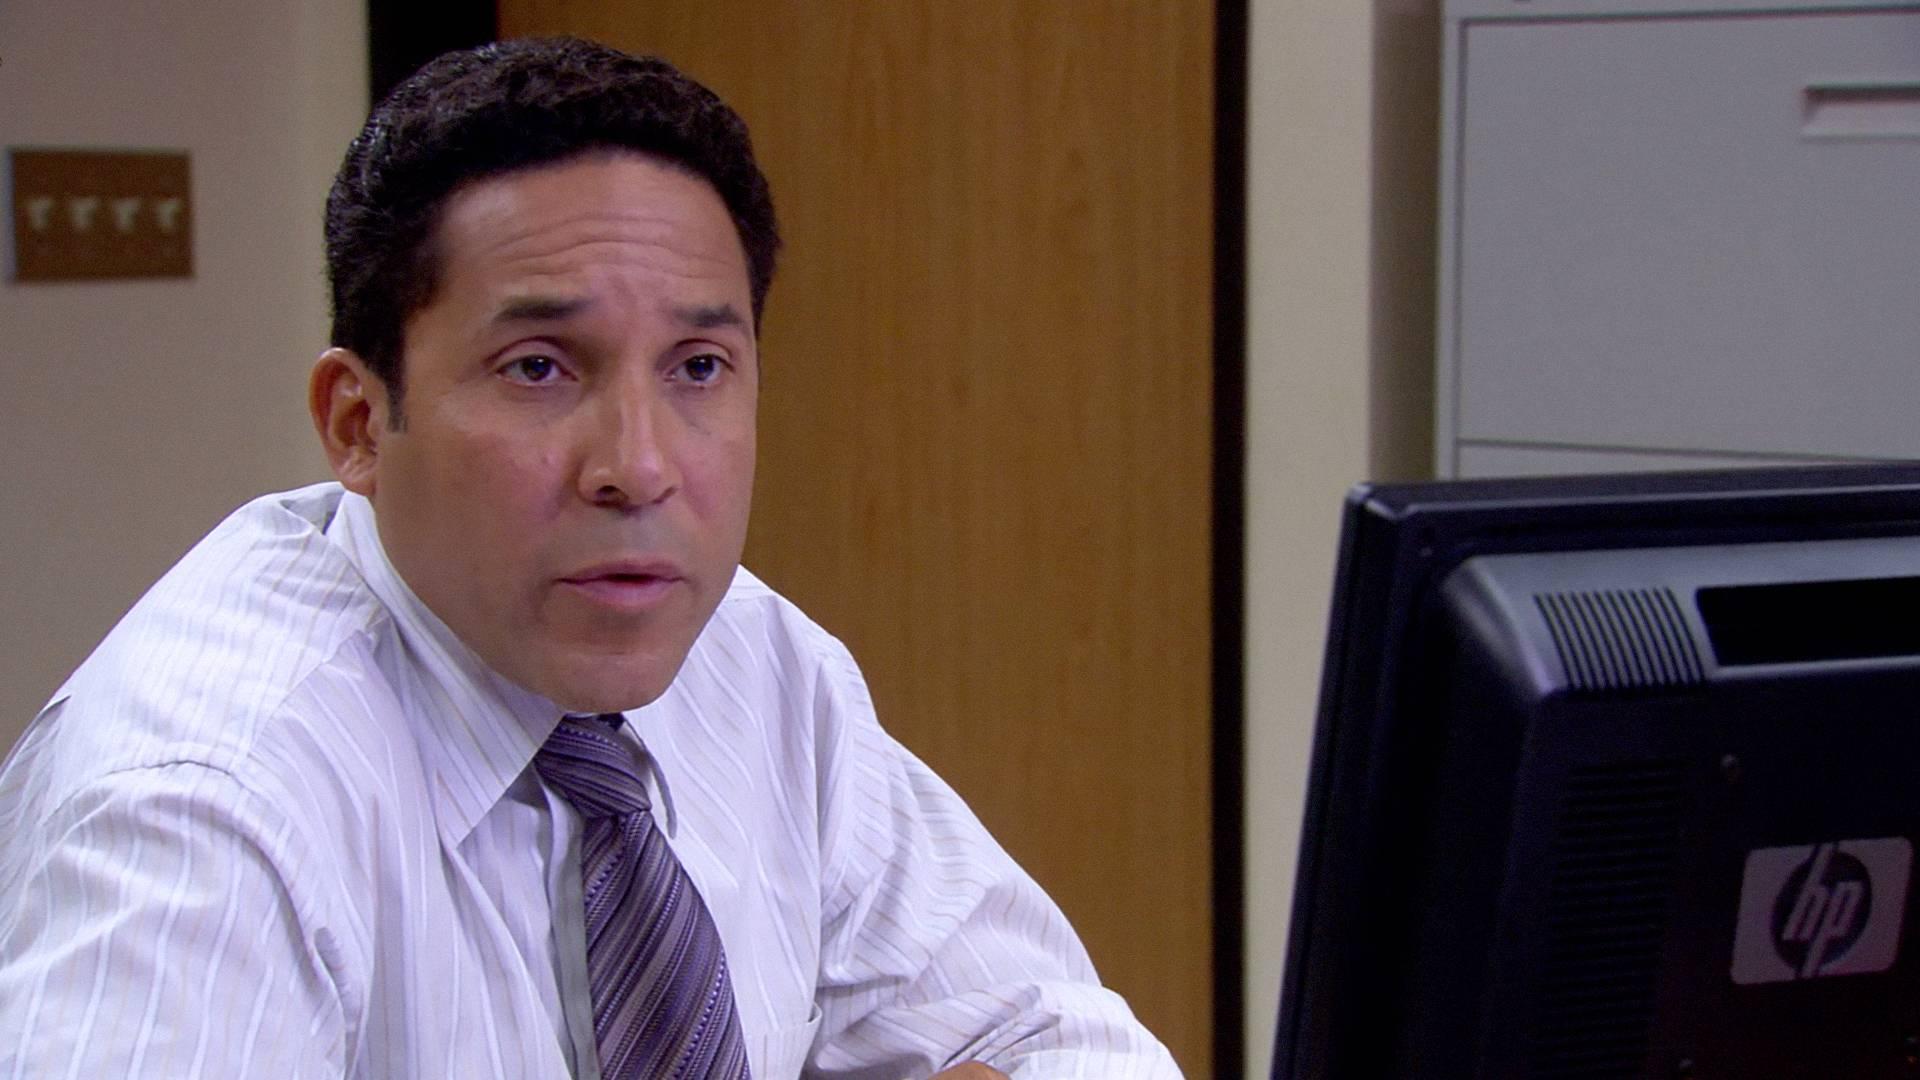 The Office Season 3 Episode 14